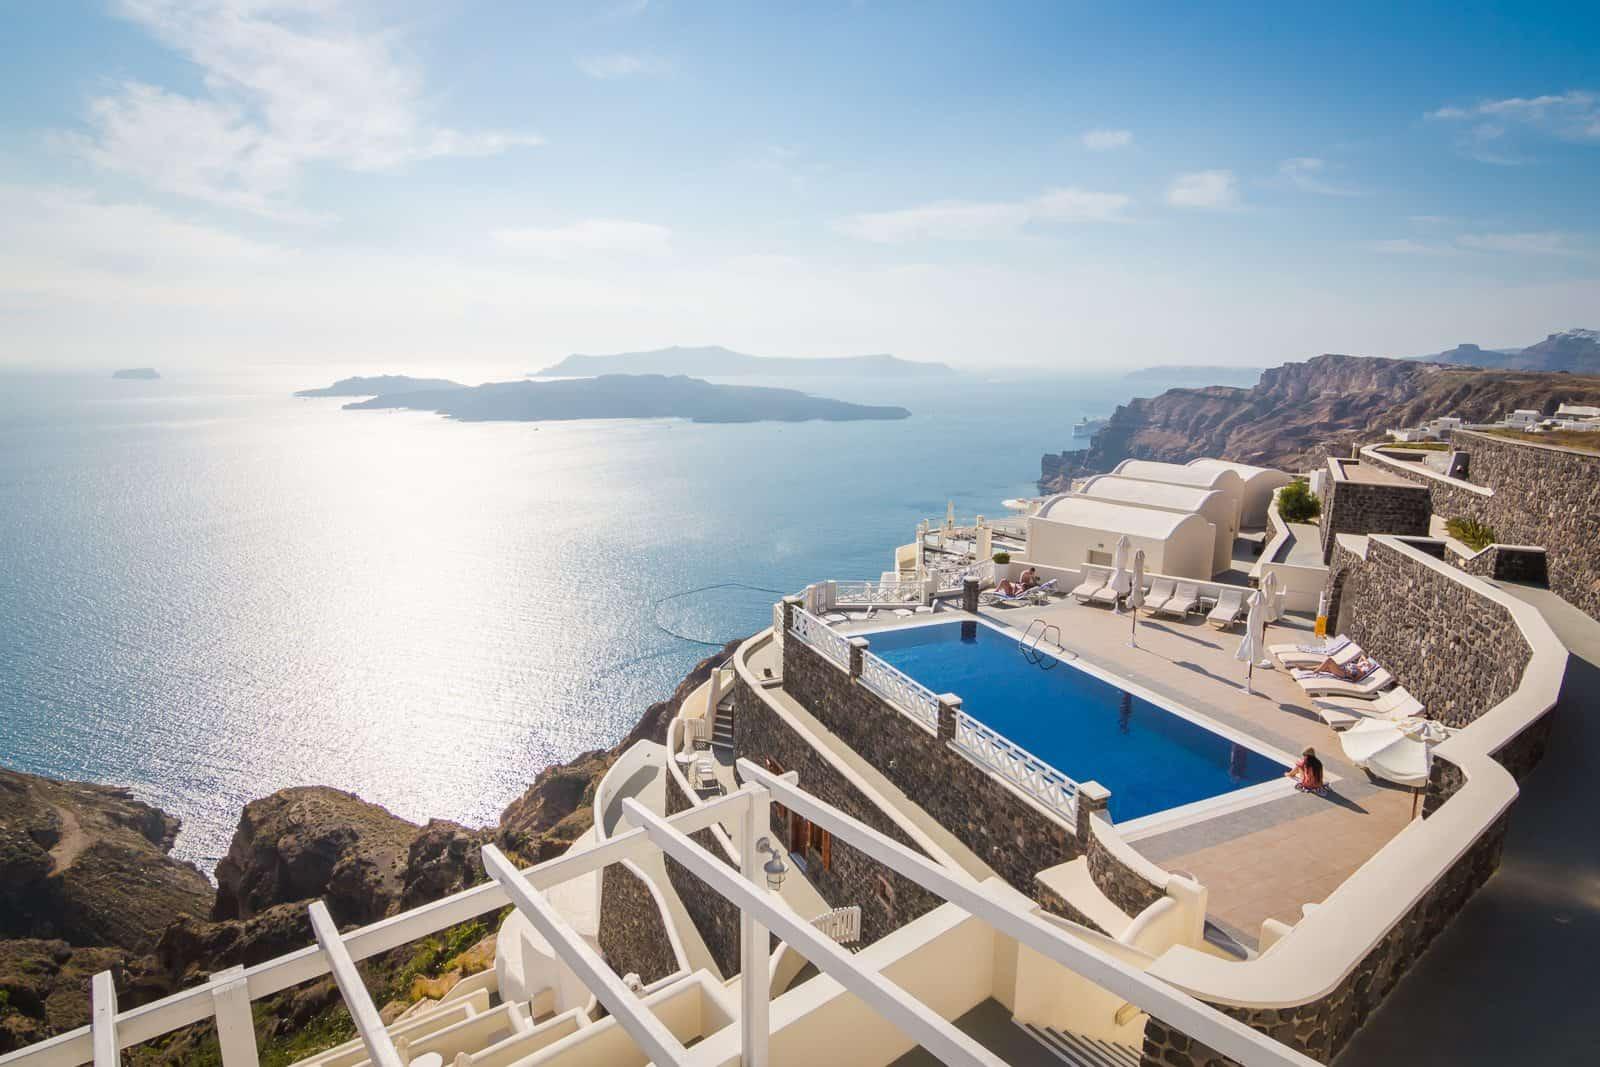 Santorini Swimming Pool, Pictures of Greece